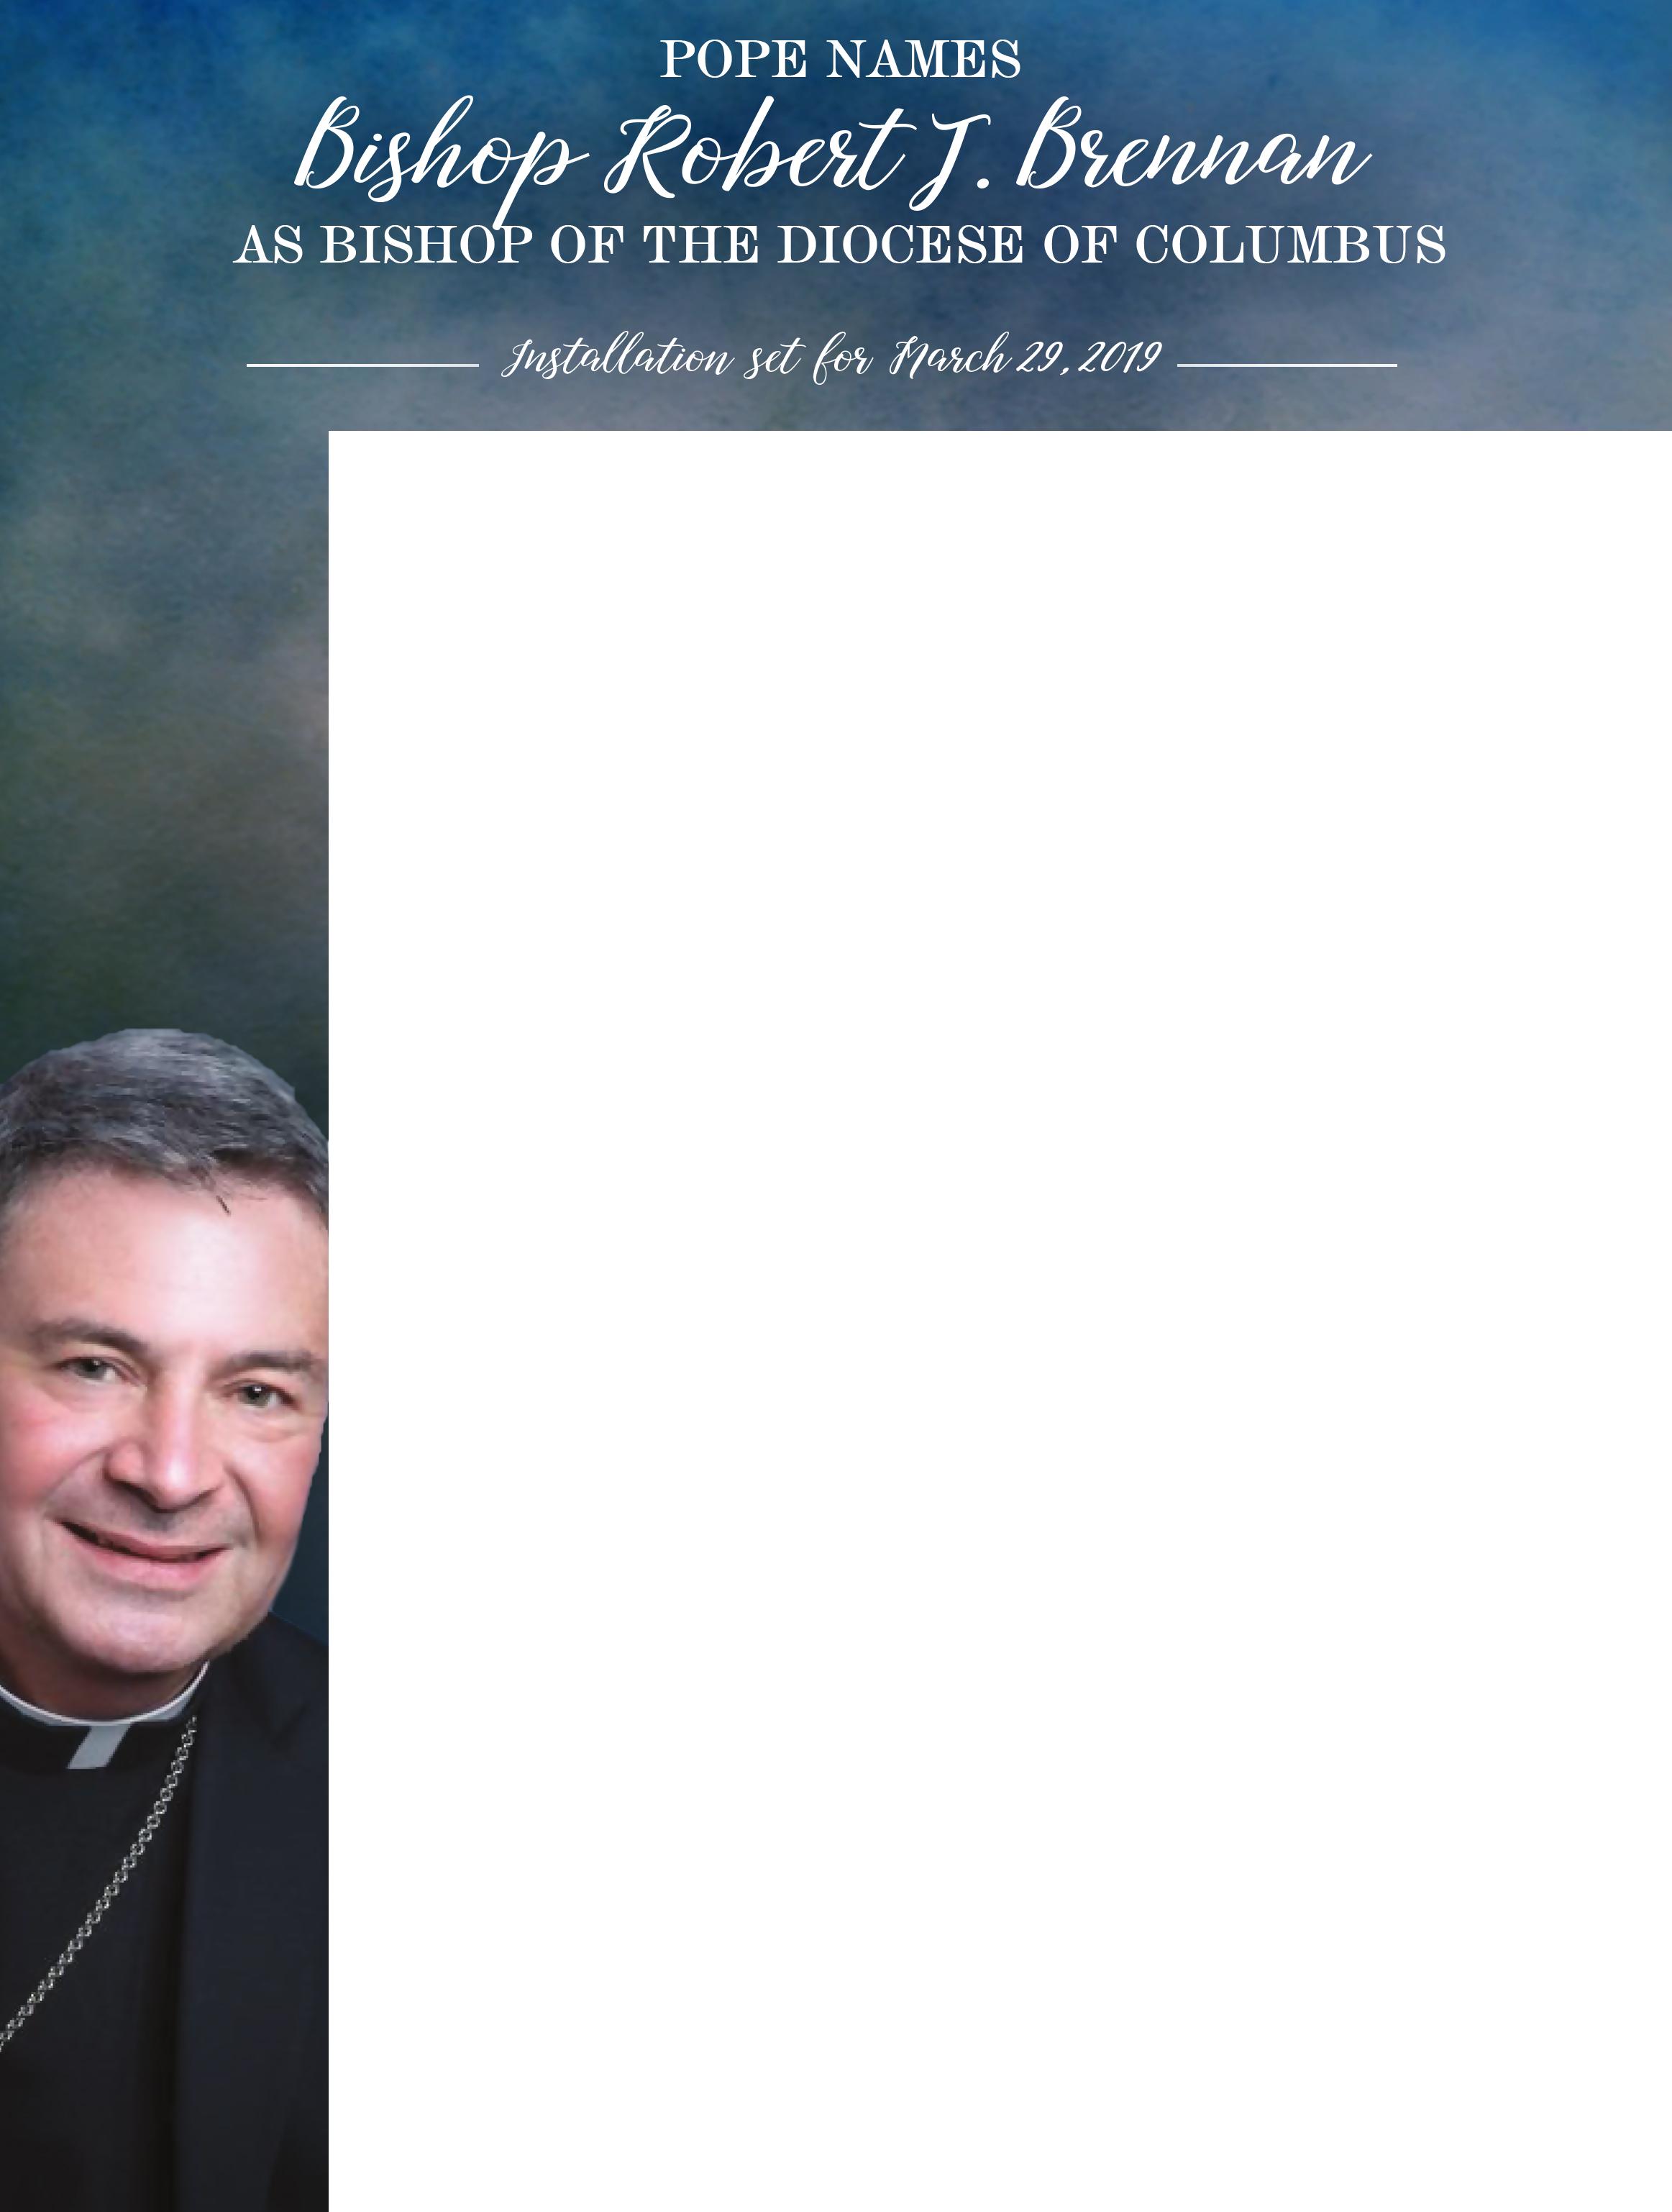 Bishop Robert J Brennan Wrapper